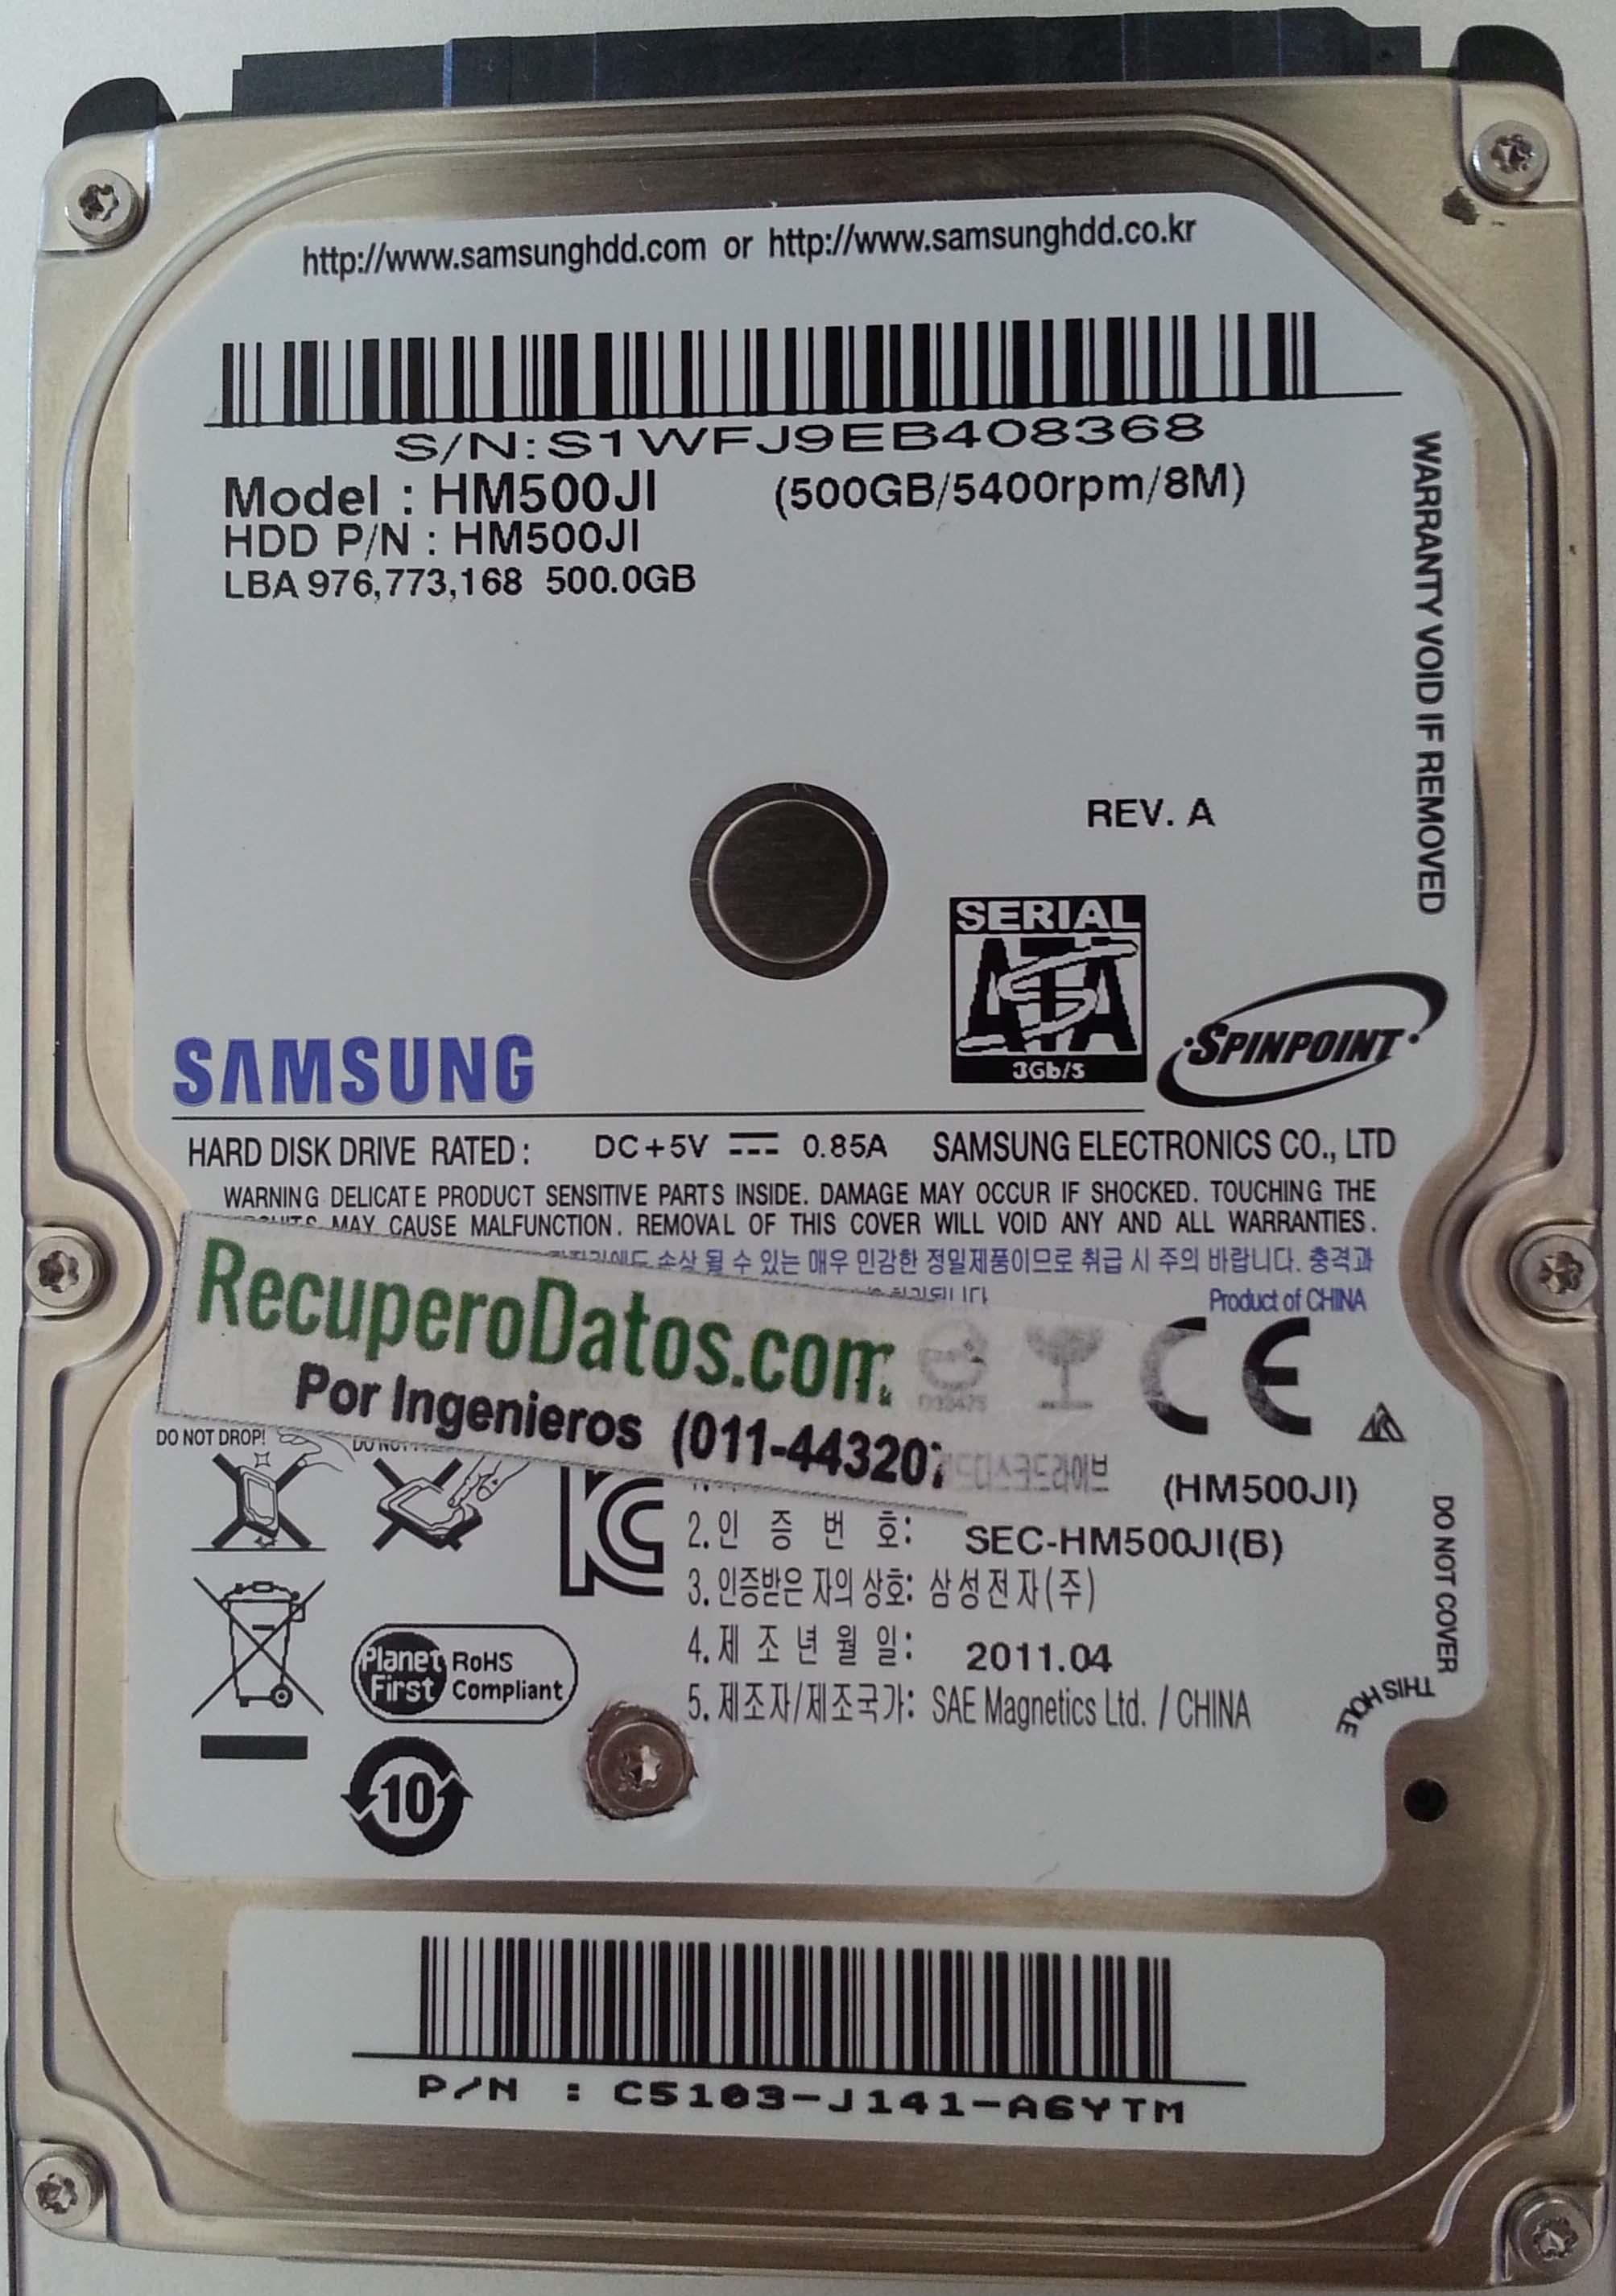 Samsung HM500JI 500GB SATA | RecuperoDatos com